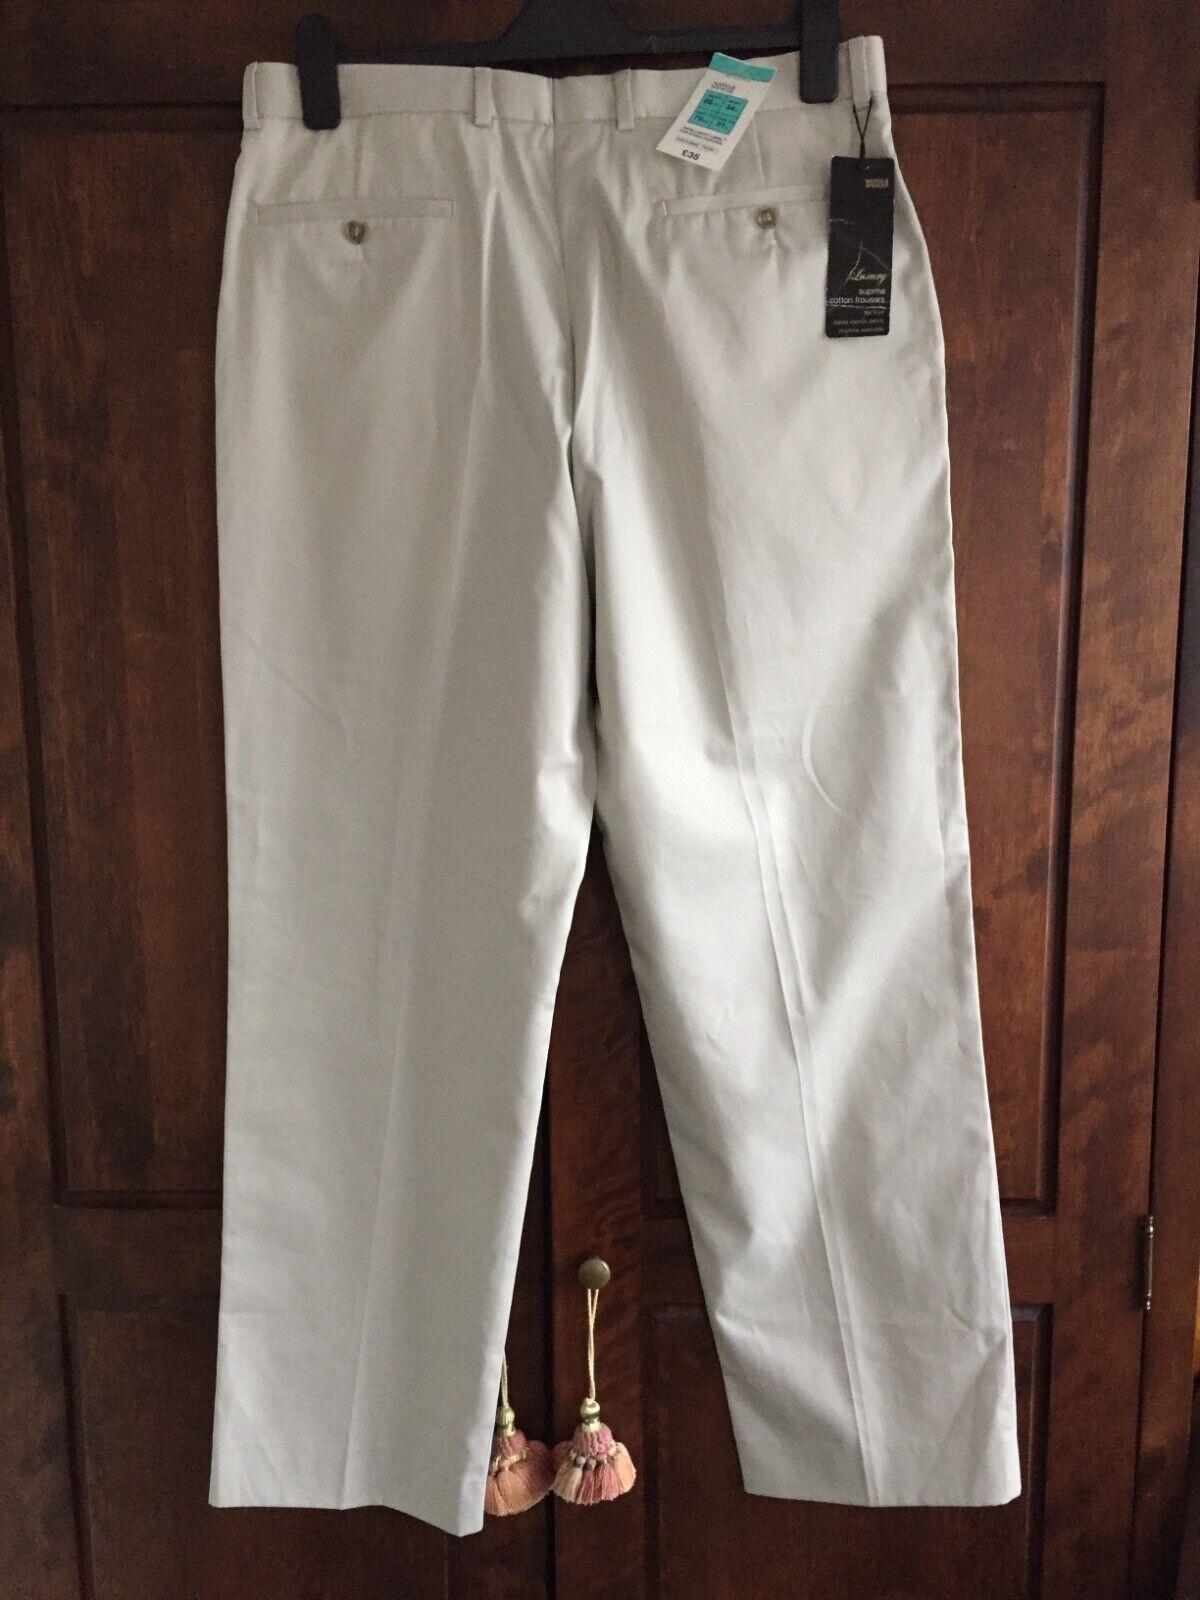 M&S Supima Cotton Trousers (34inch waist 31inch inside leg).